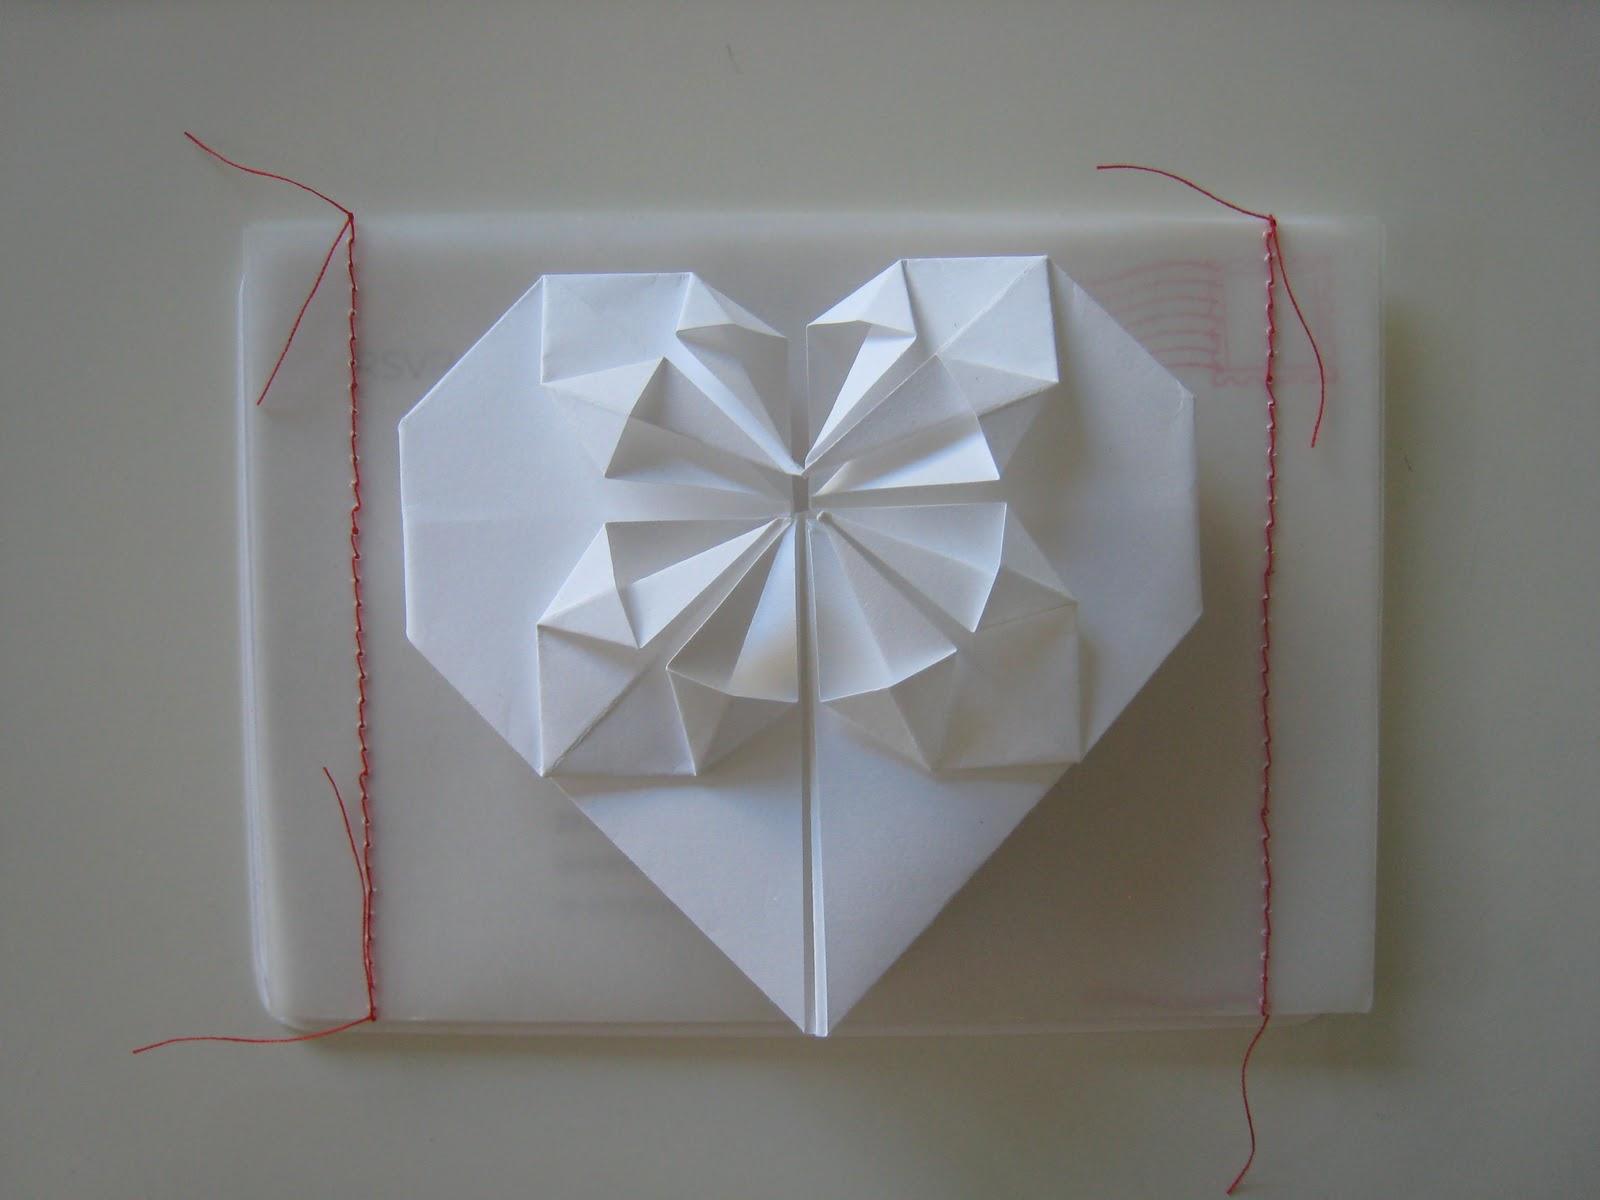 Wedding Invite | Charlotte Minty Interior Design - photo#50